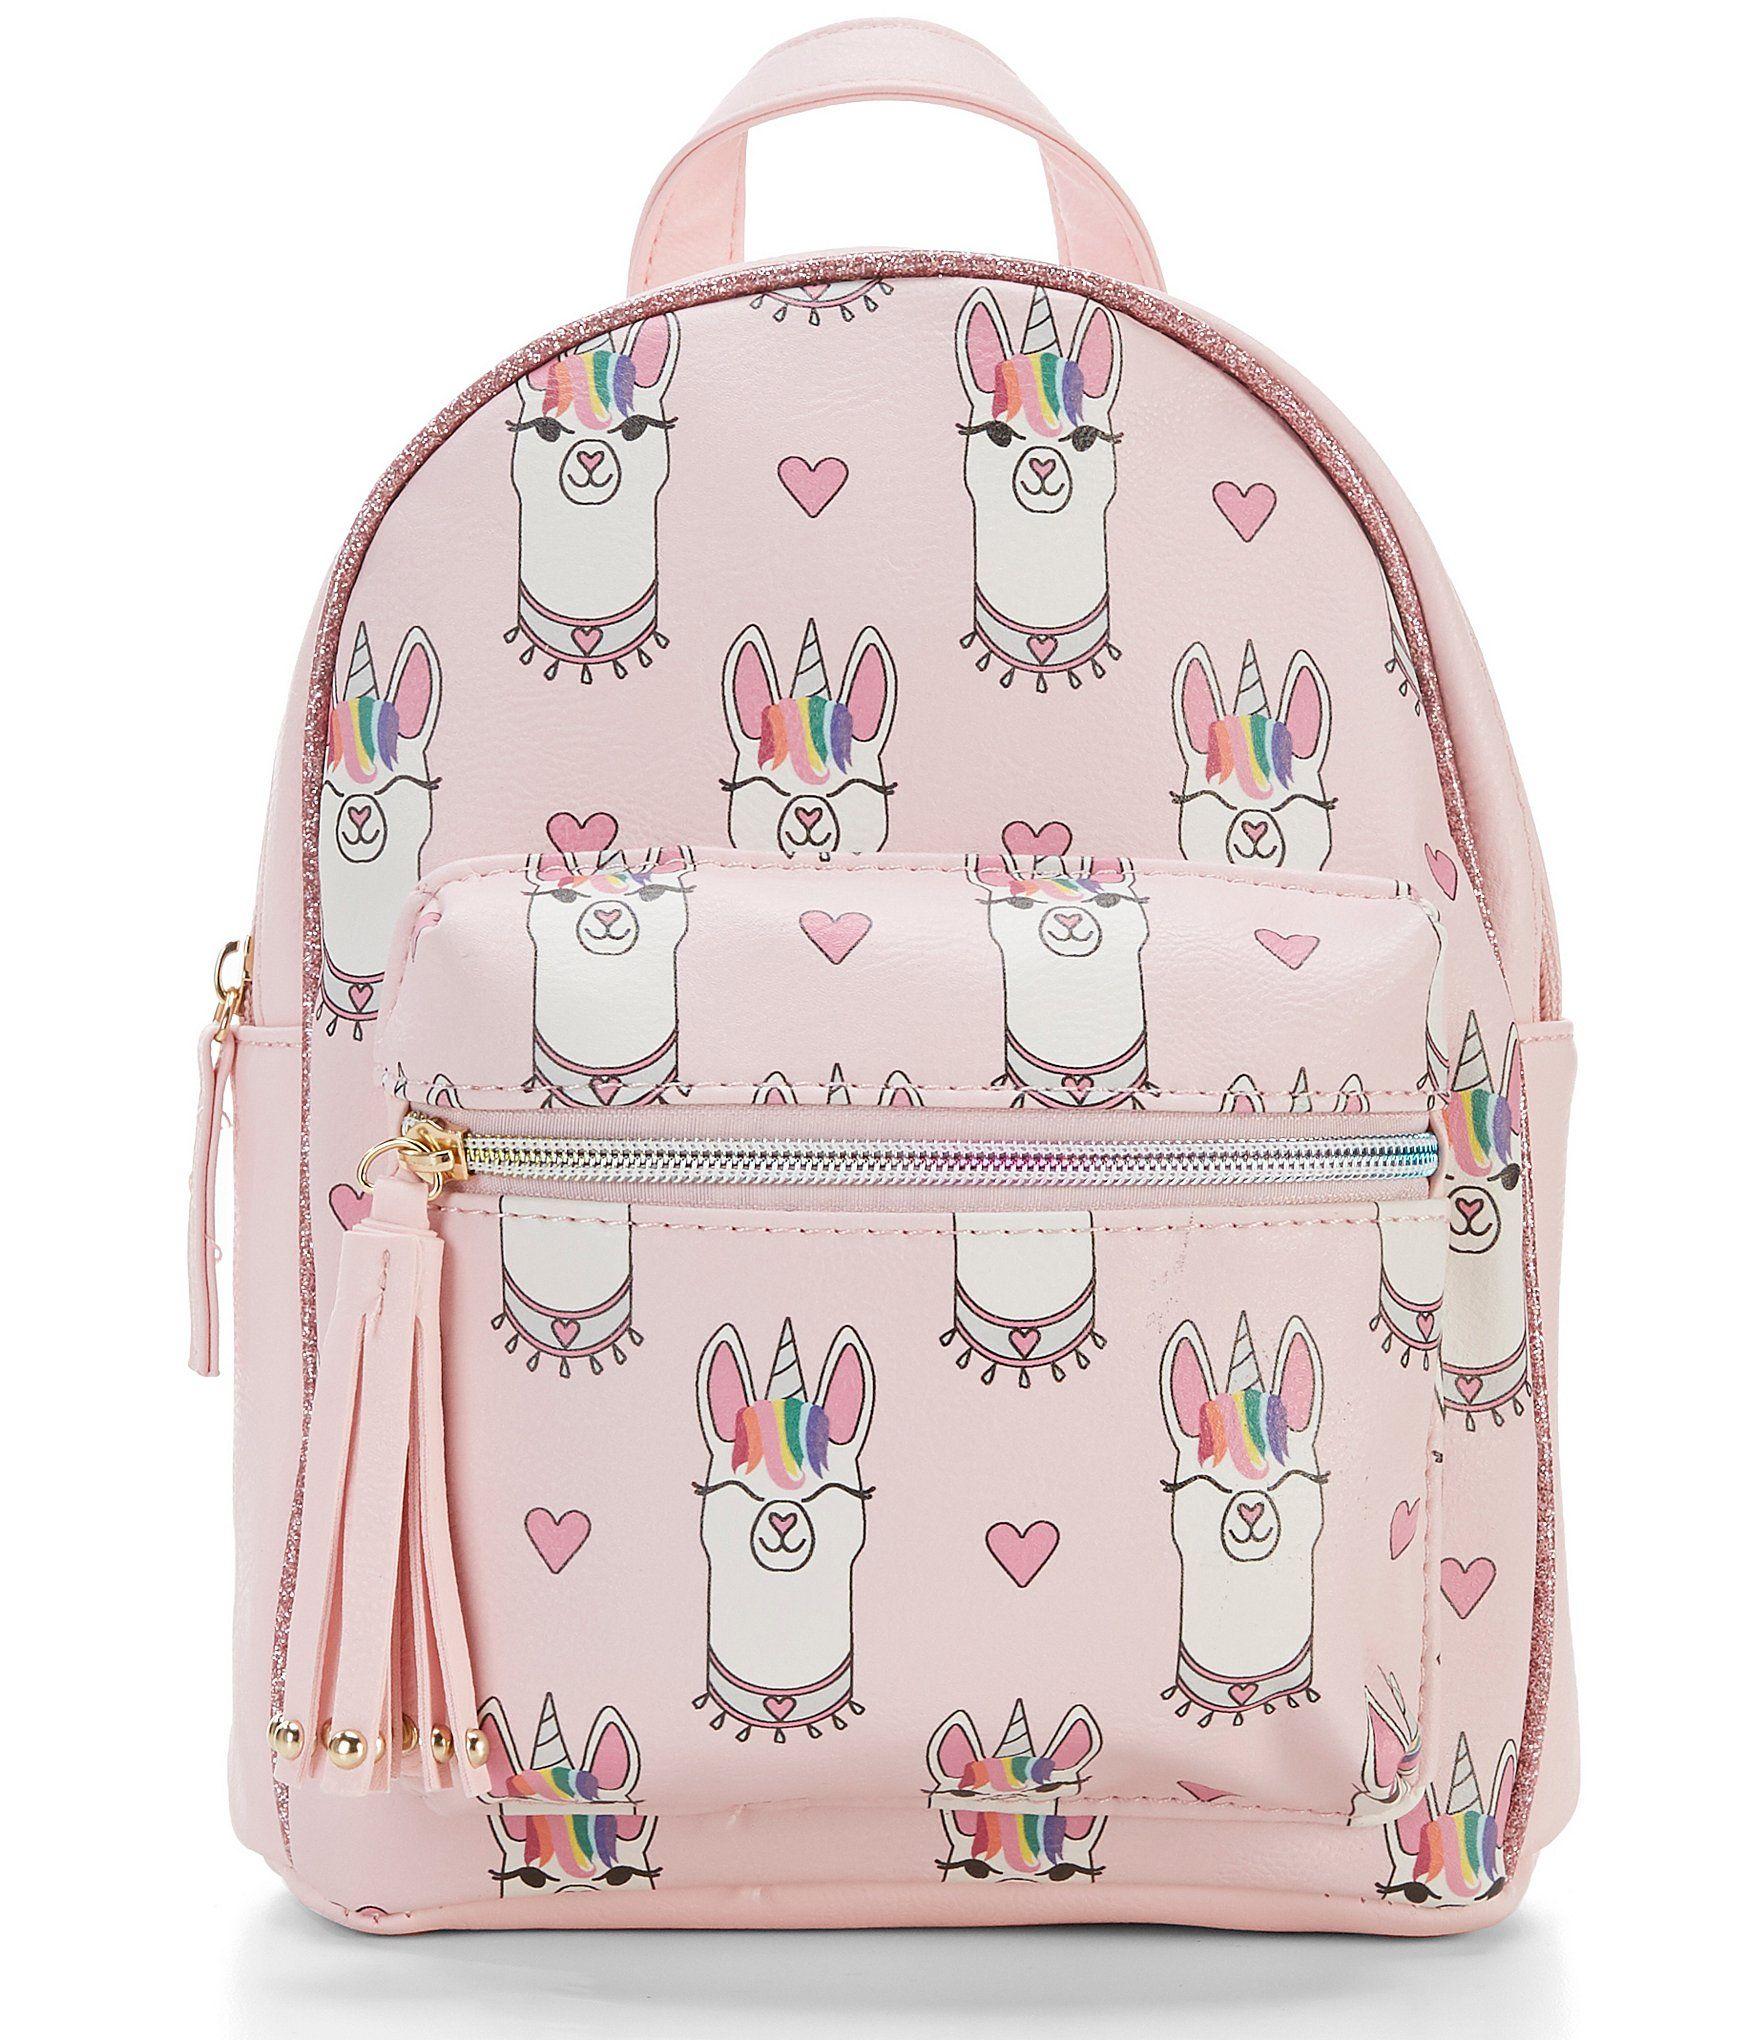 b5e68d5a96 Shop for Omg Accessories Girls Rainbow Unicorn Llama Mini Backpack at  Dillards.com. Visit Dillards.com to find clothing